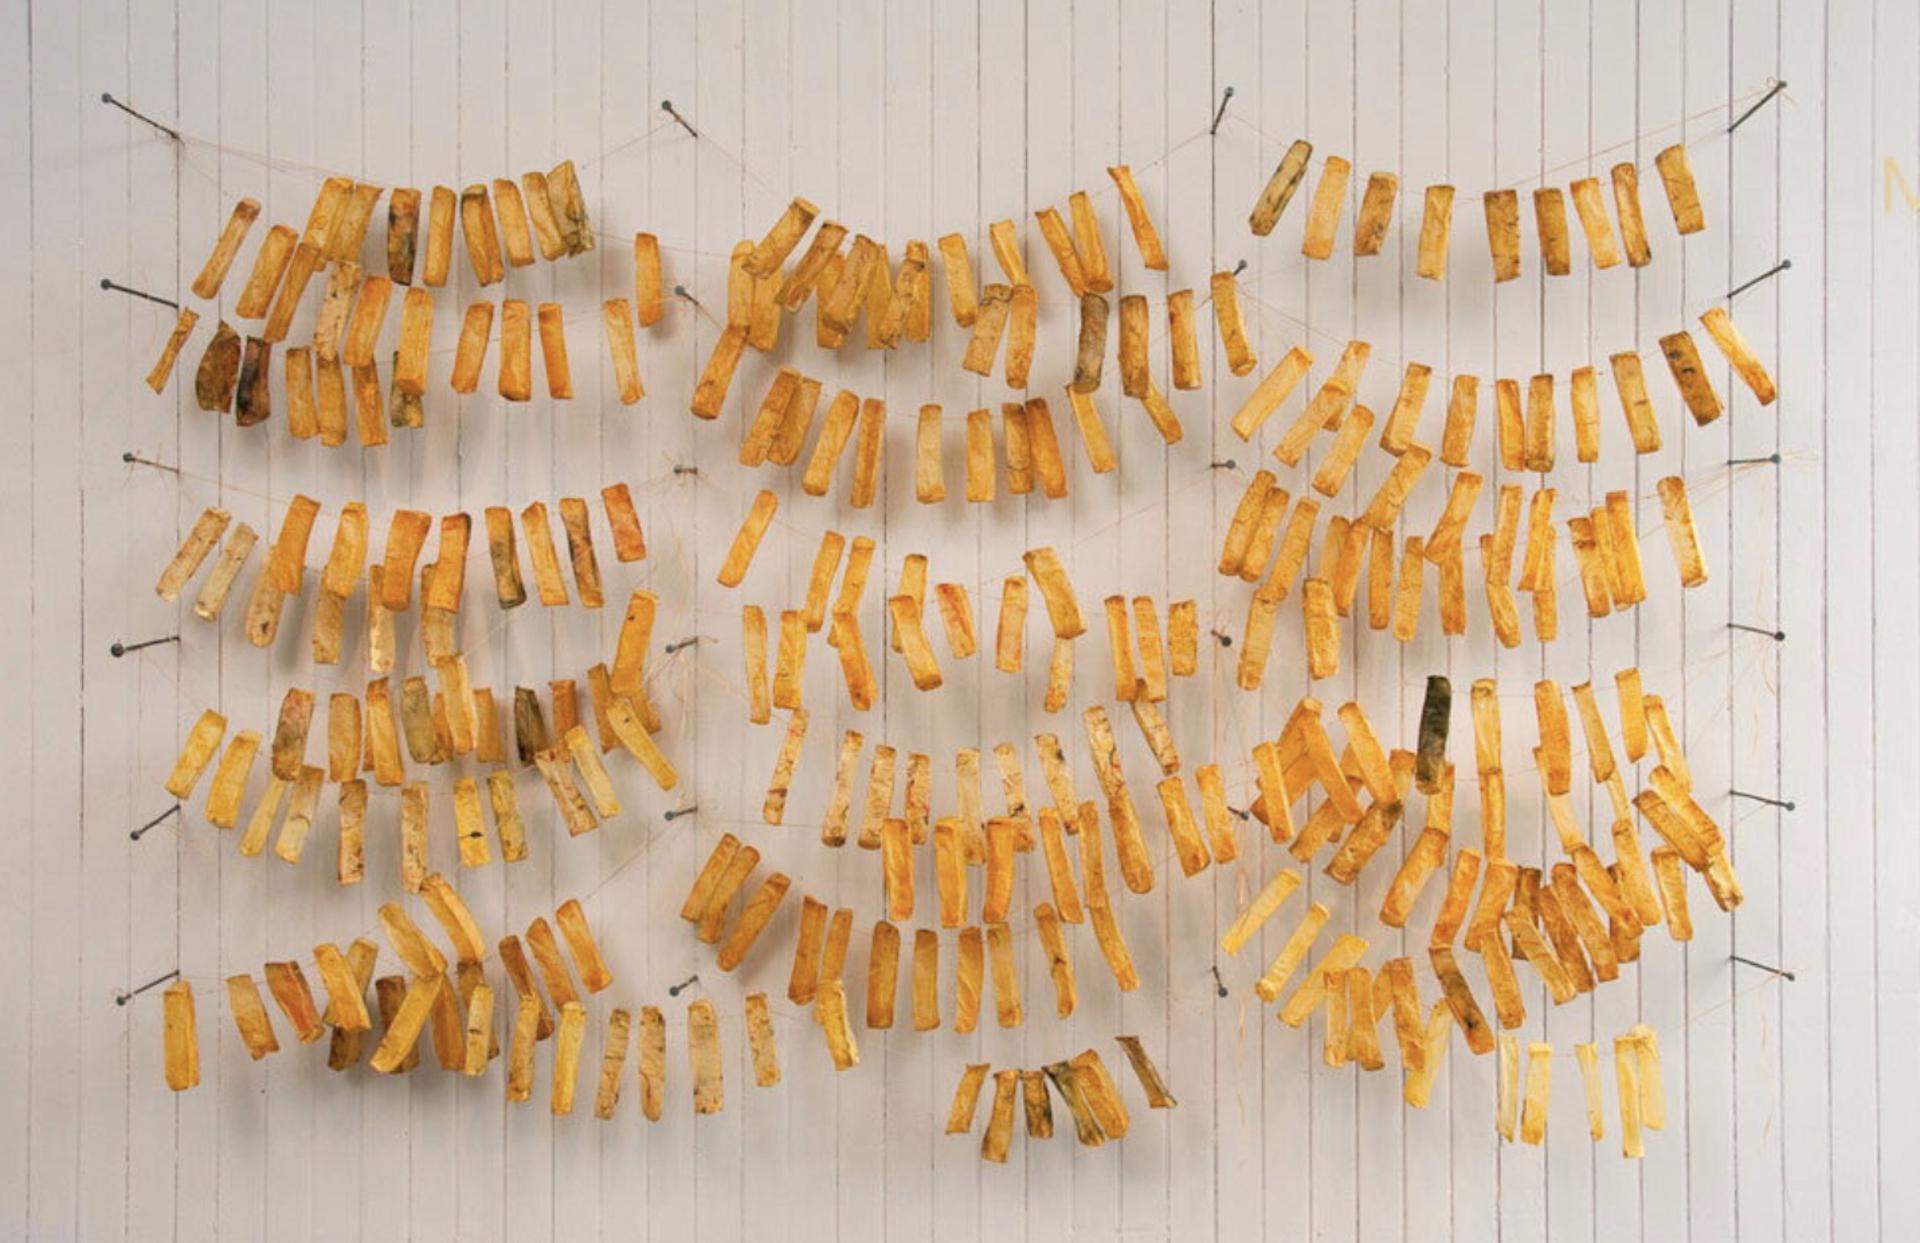 YELLOW CHEESE by Lori Goodman